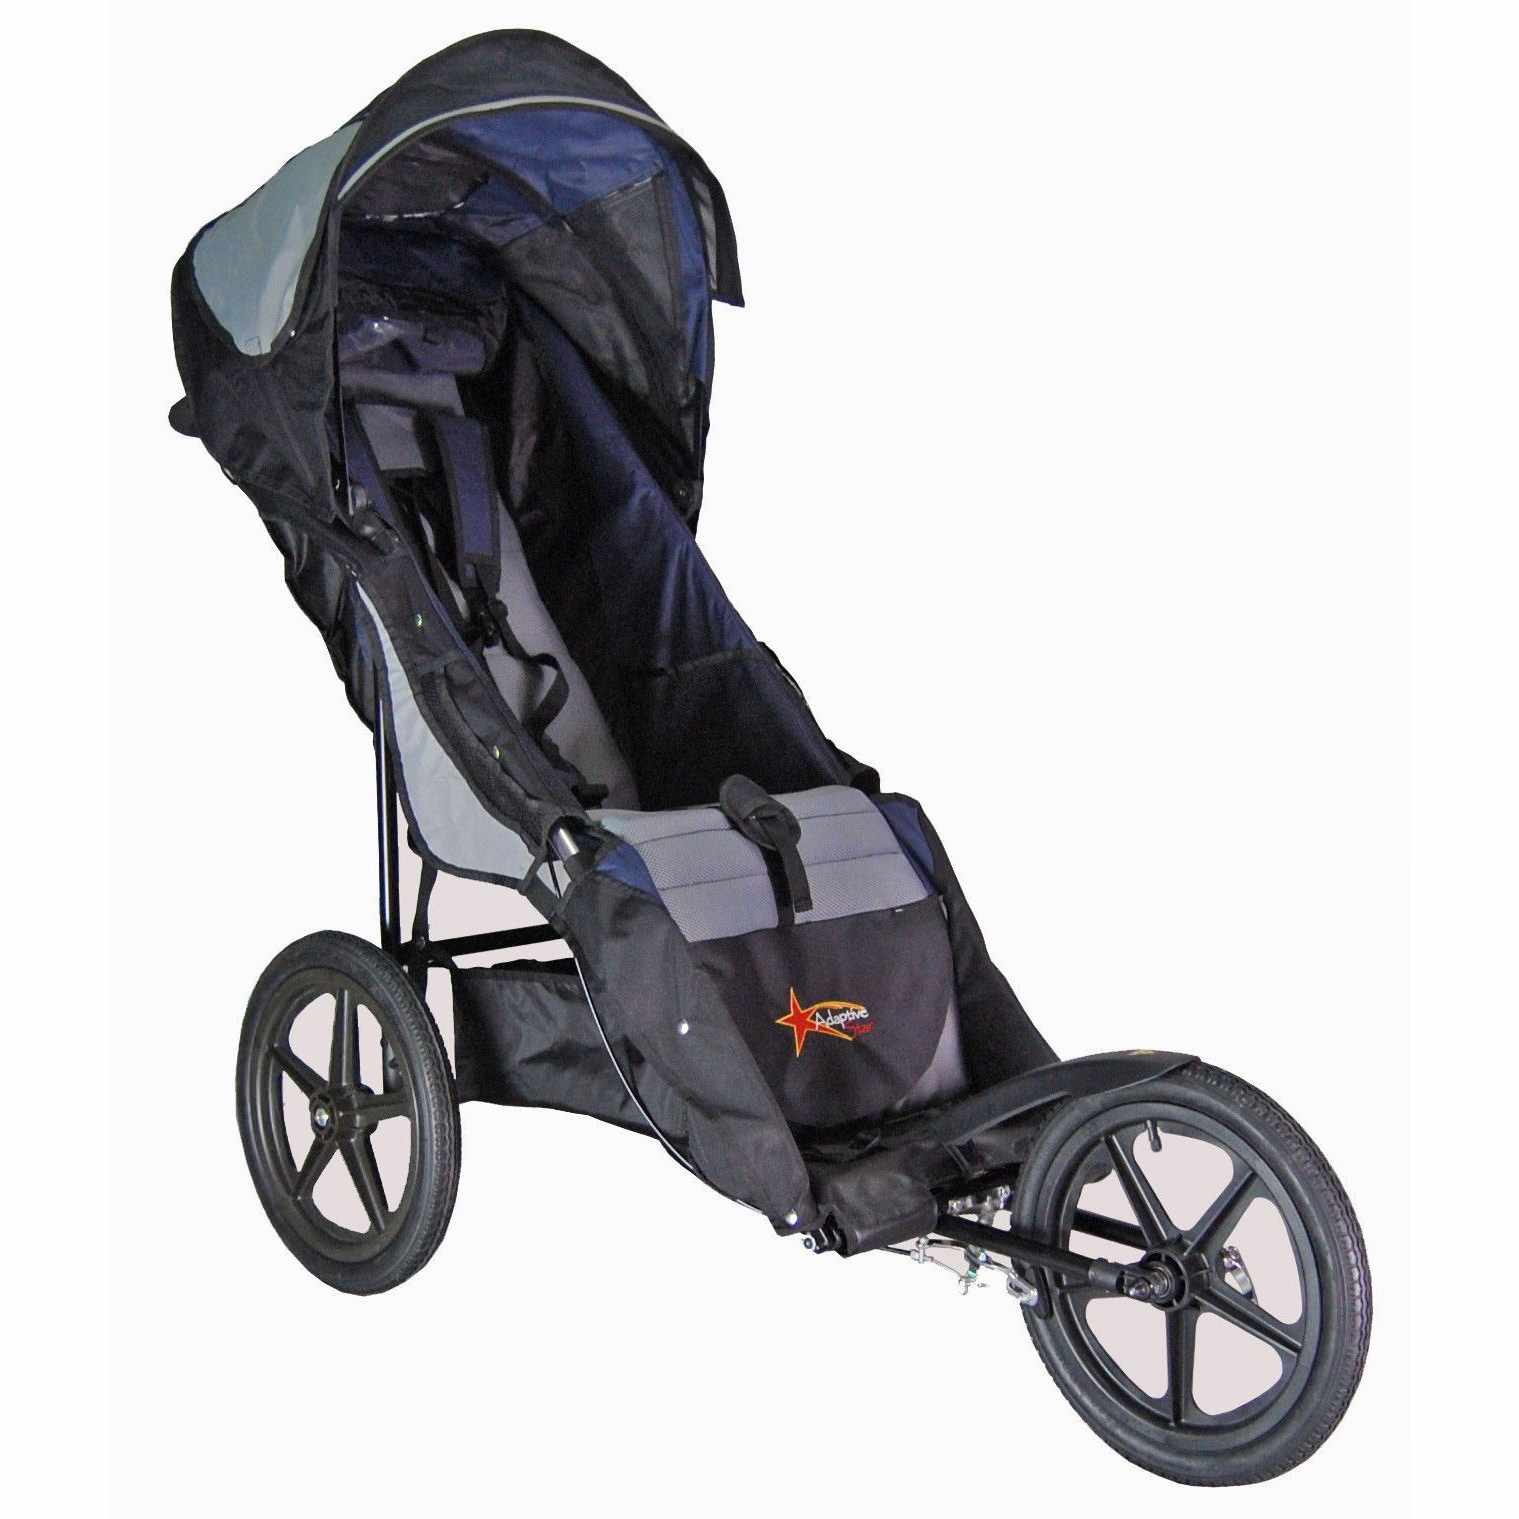 Adaptive star stroller - Folded